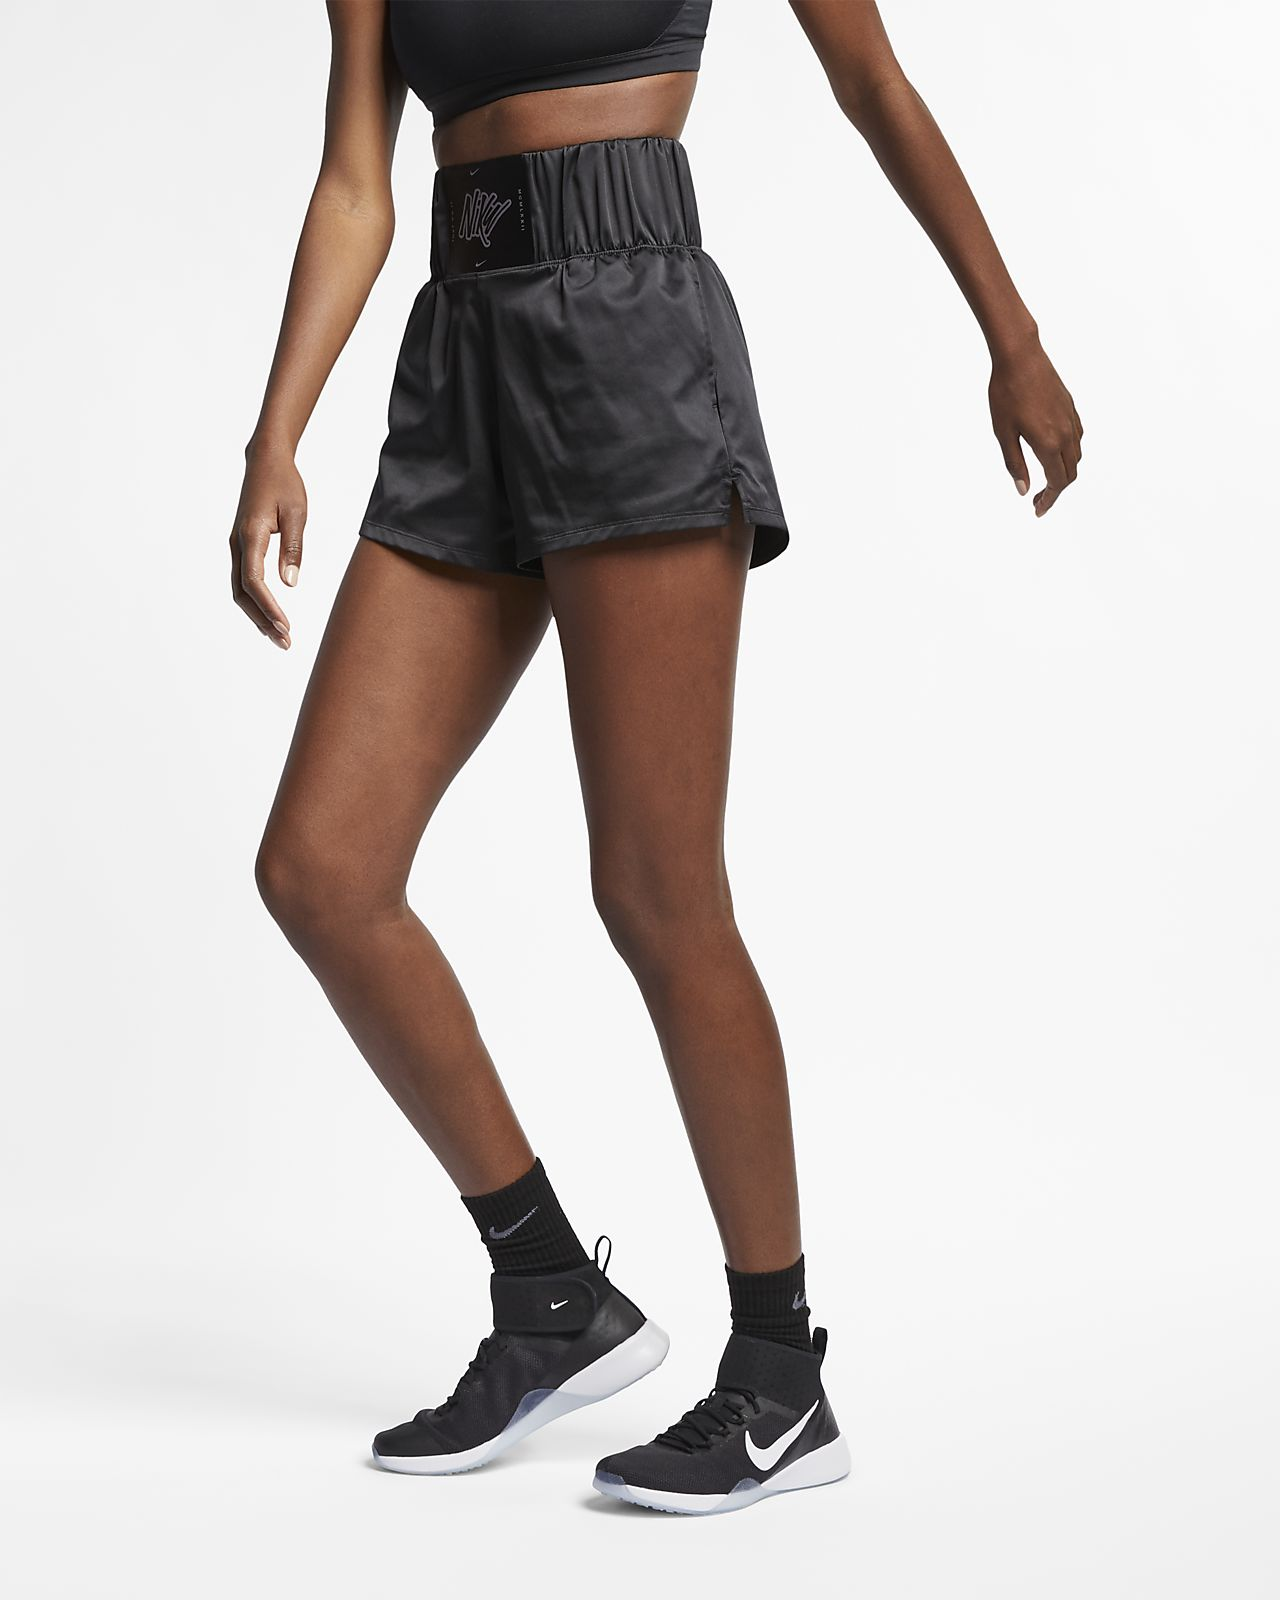 52c0a334b2b Nike Dri-FIT Women s Training Shorts. Nike.com CA